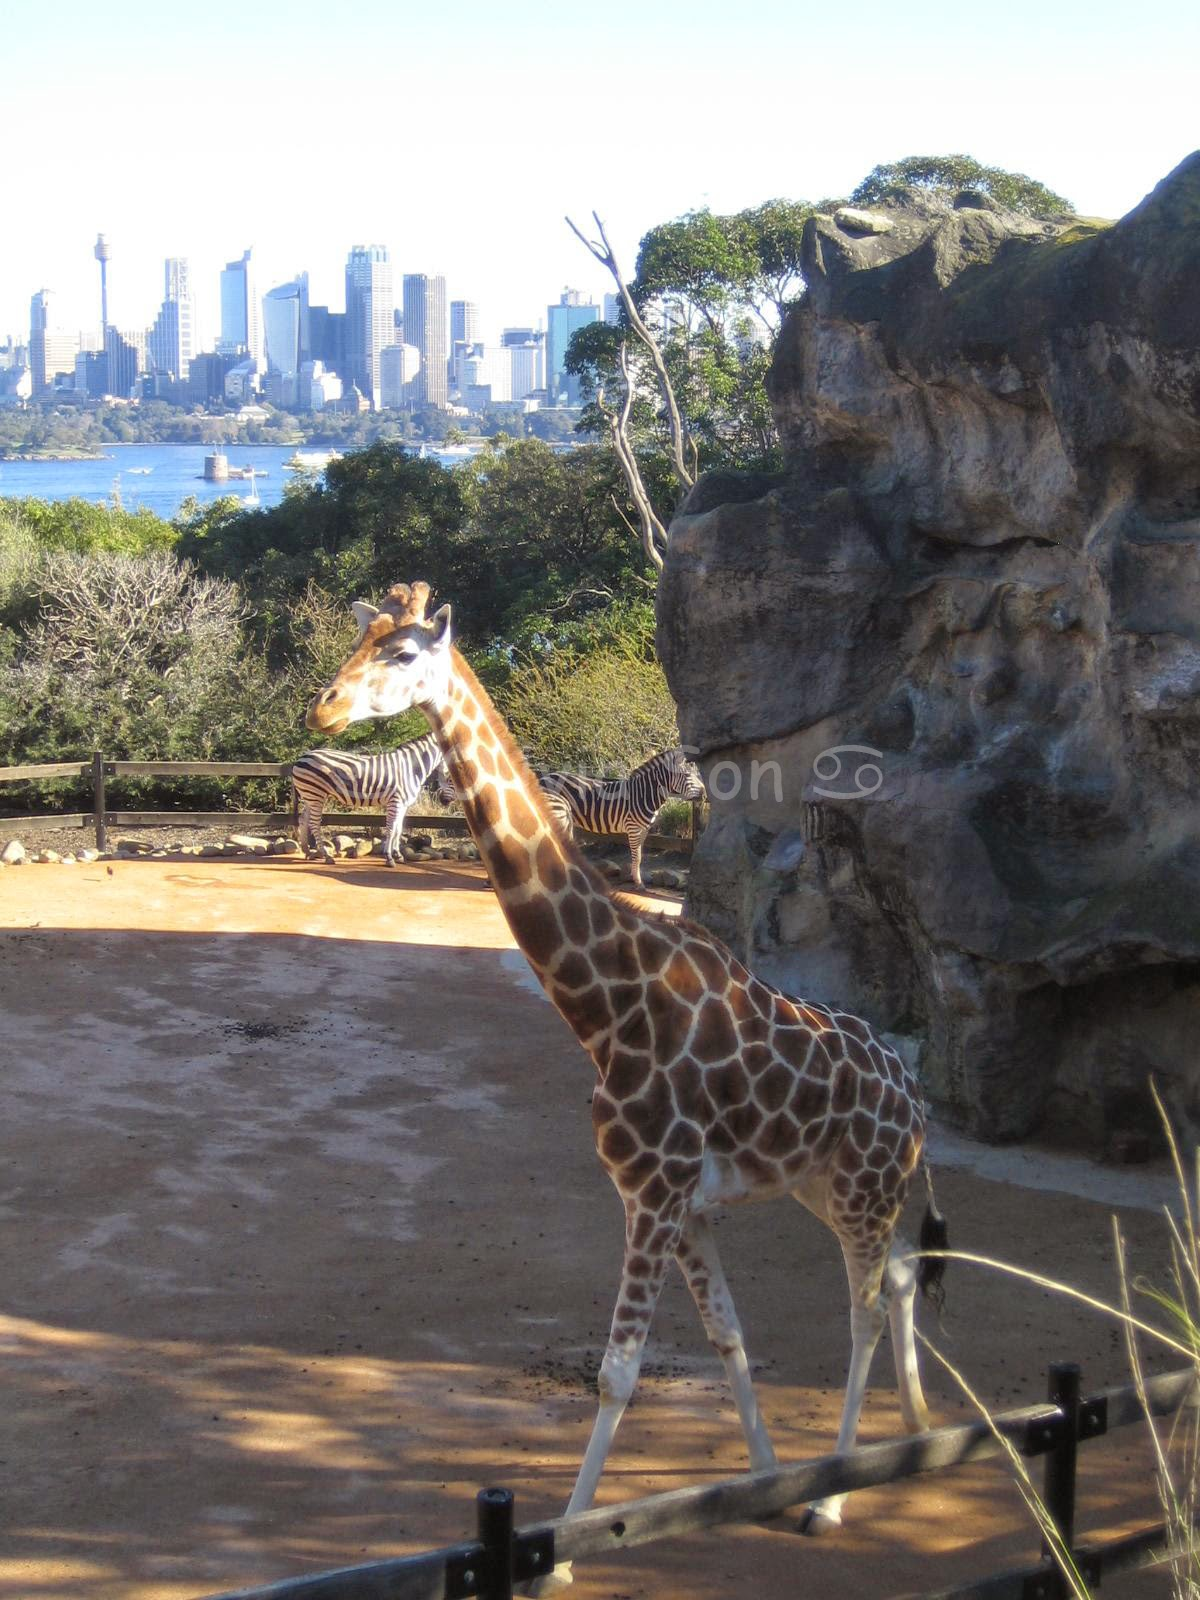 Girafe Taronga Zoo, Sydney, Australie